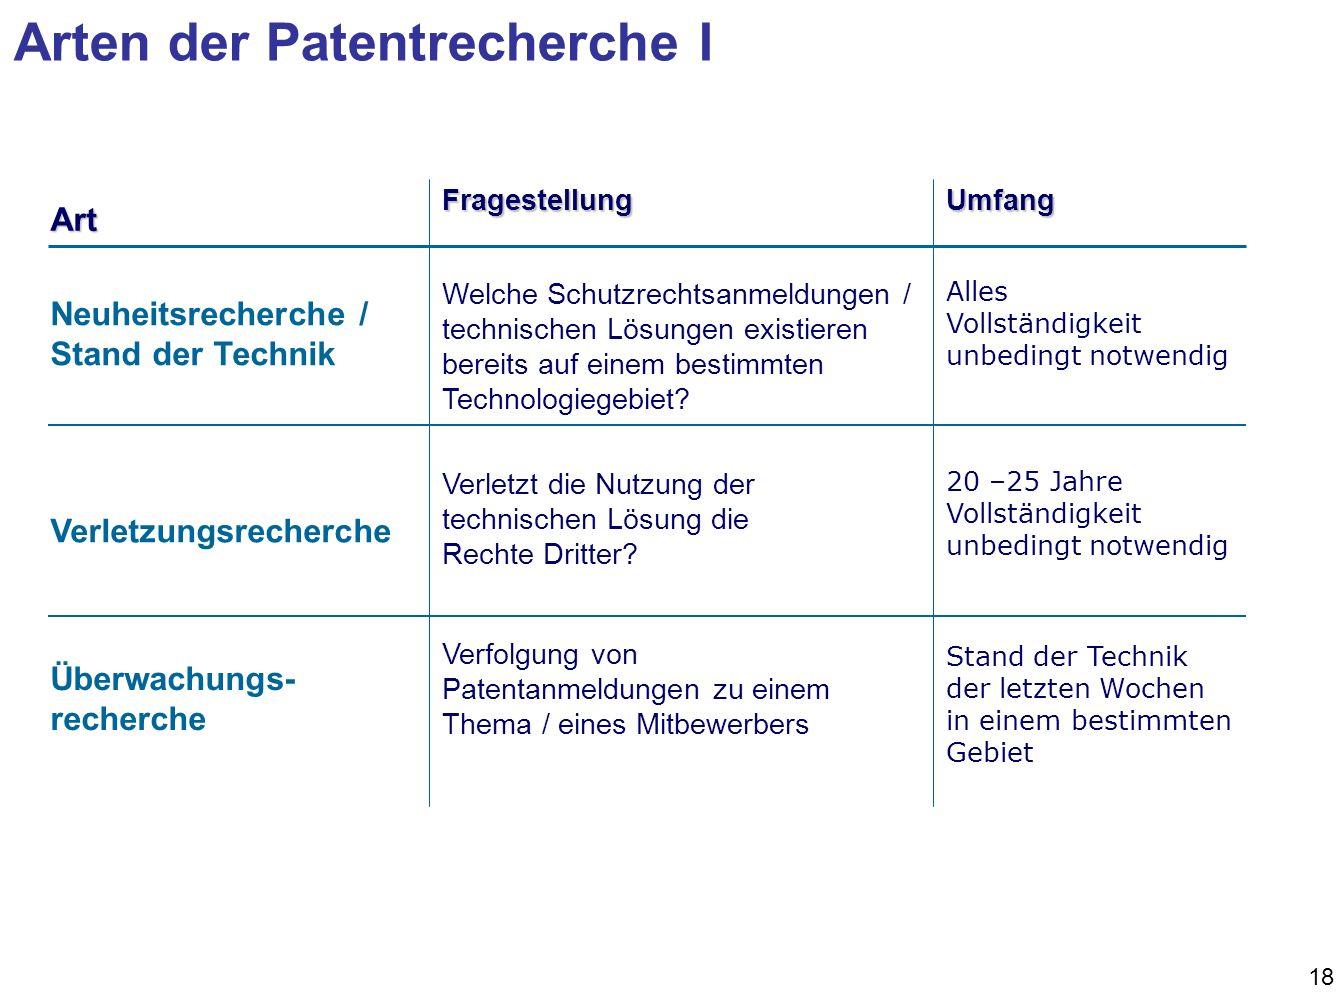 Arten der Patentrecherche I